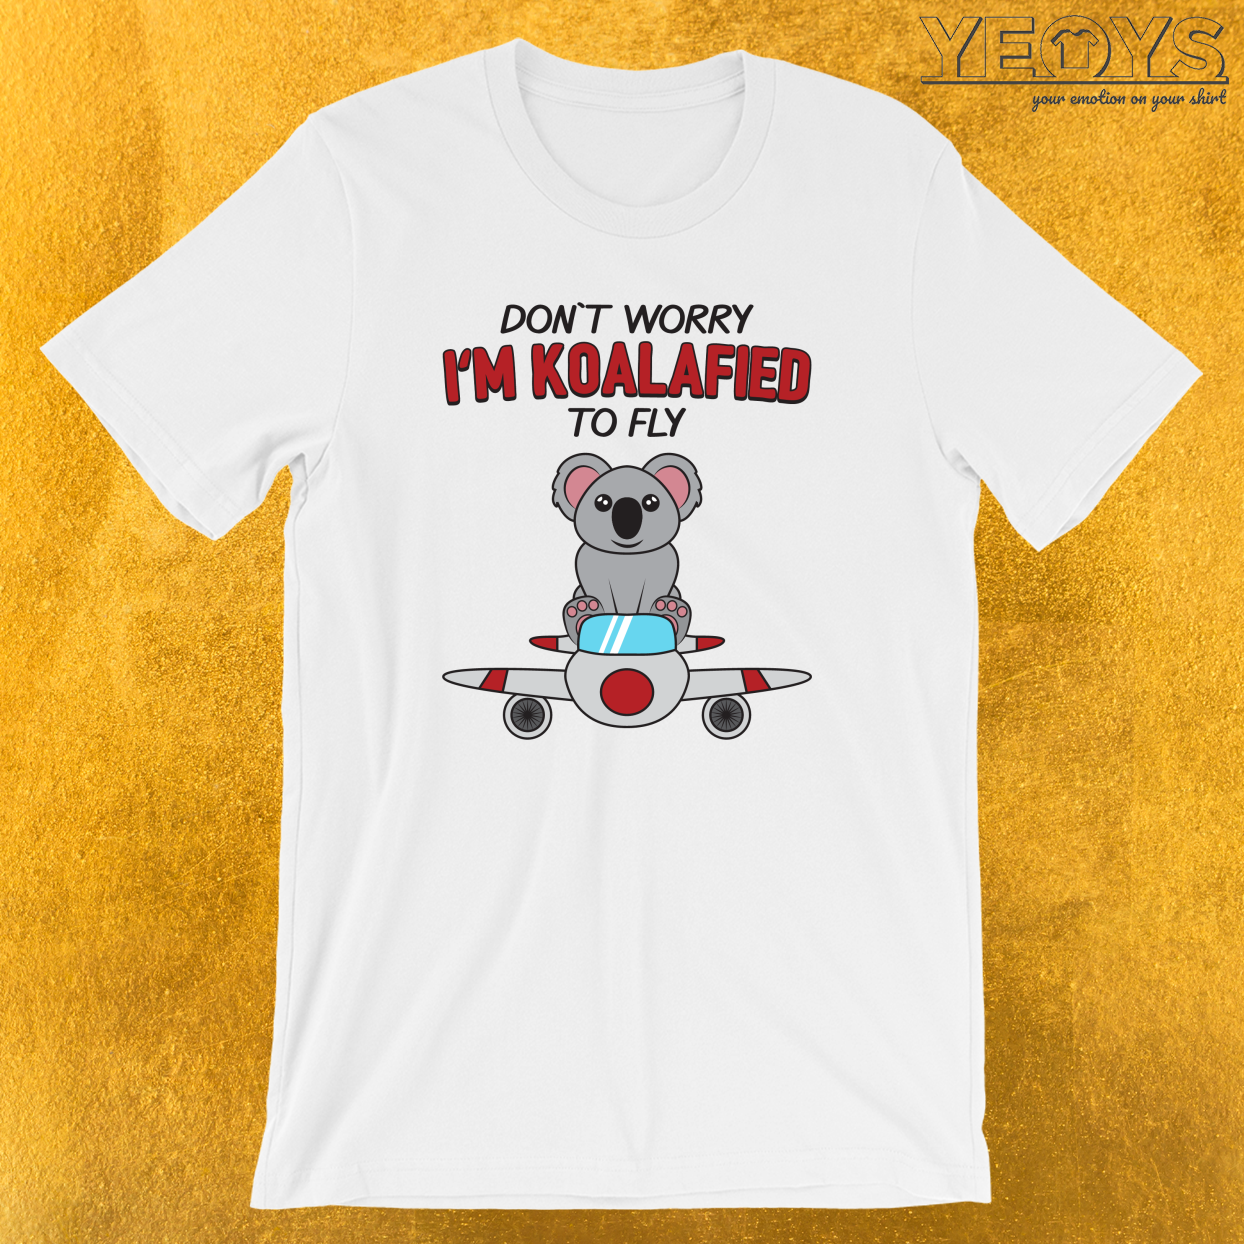 Don't Worry I'm Koalafied To Fly T-Shirt